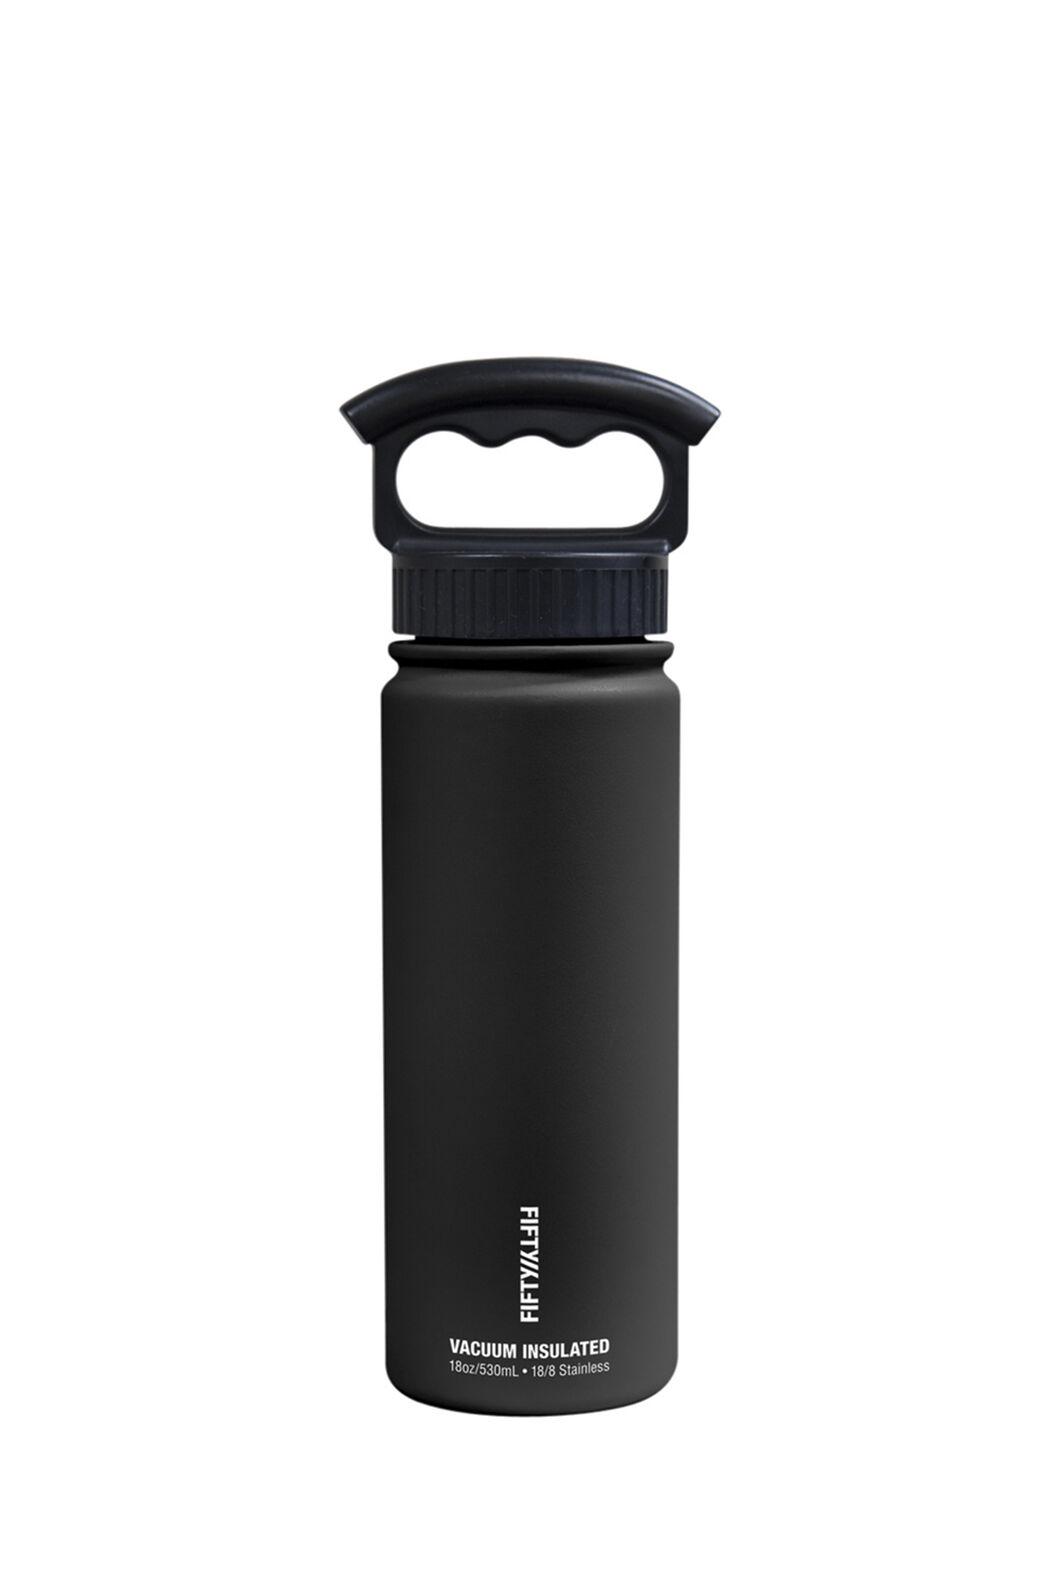 FIFTY/FIFTY® 18oz Insulated Bottle, Matt Black, hi-res